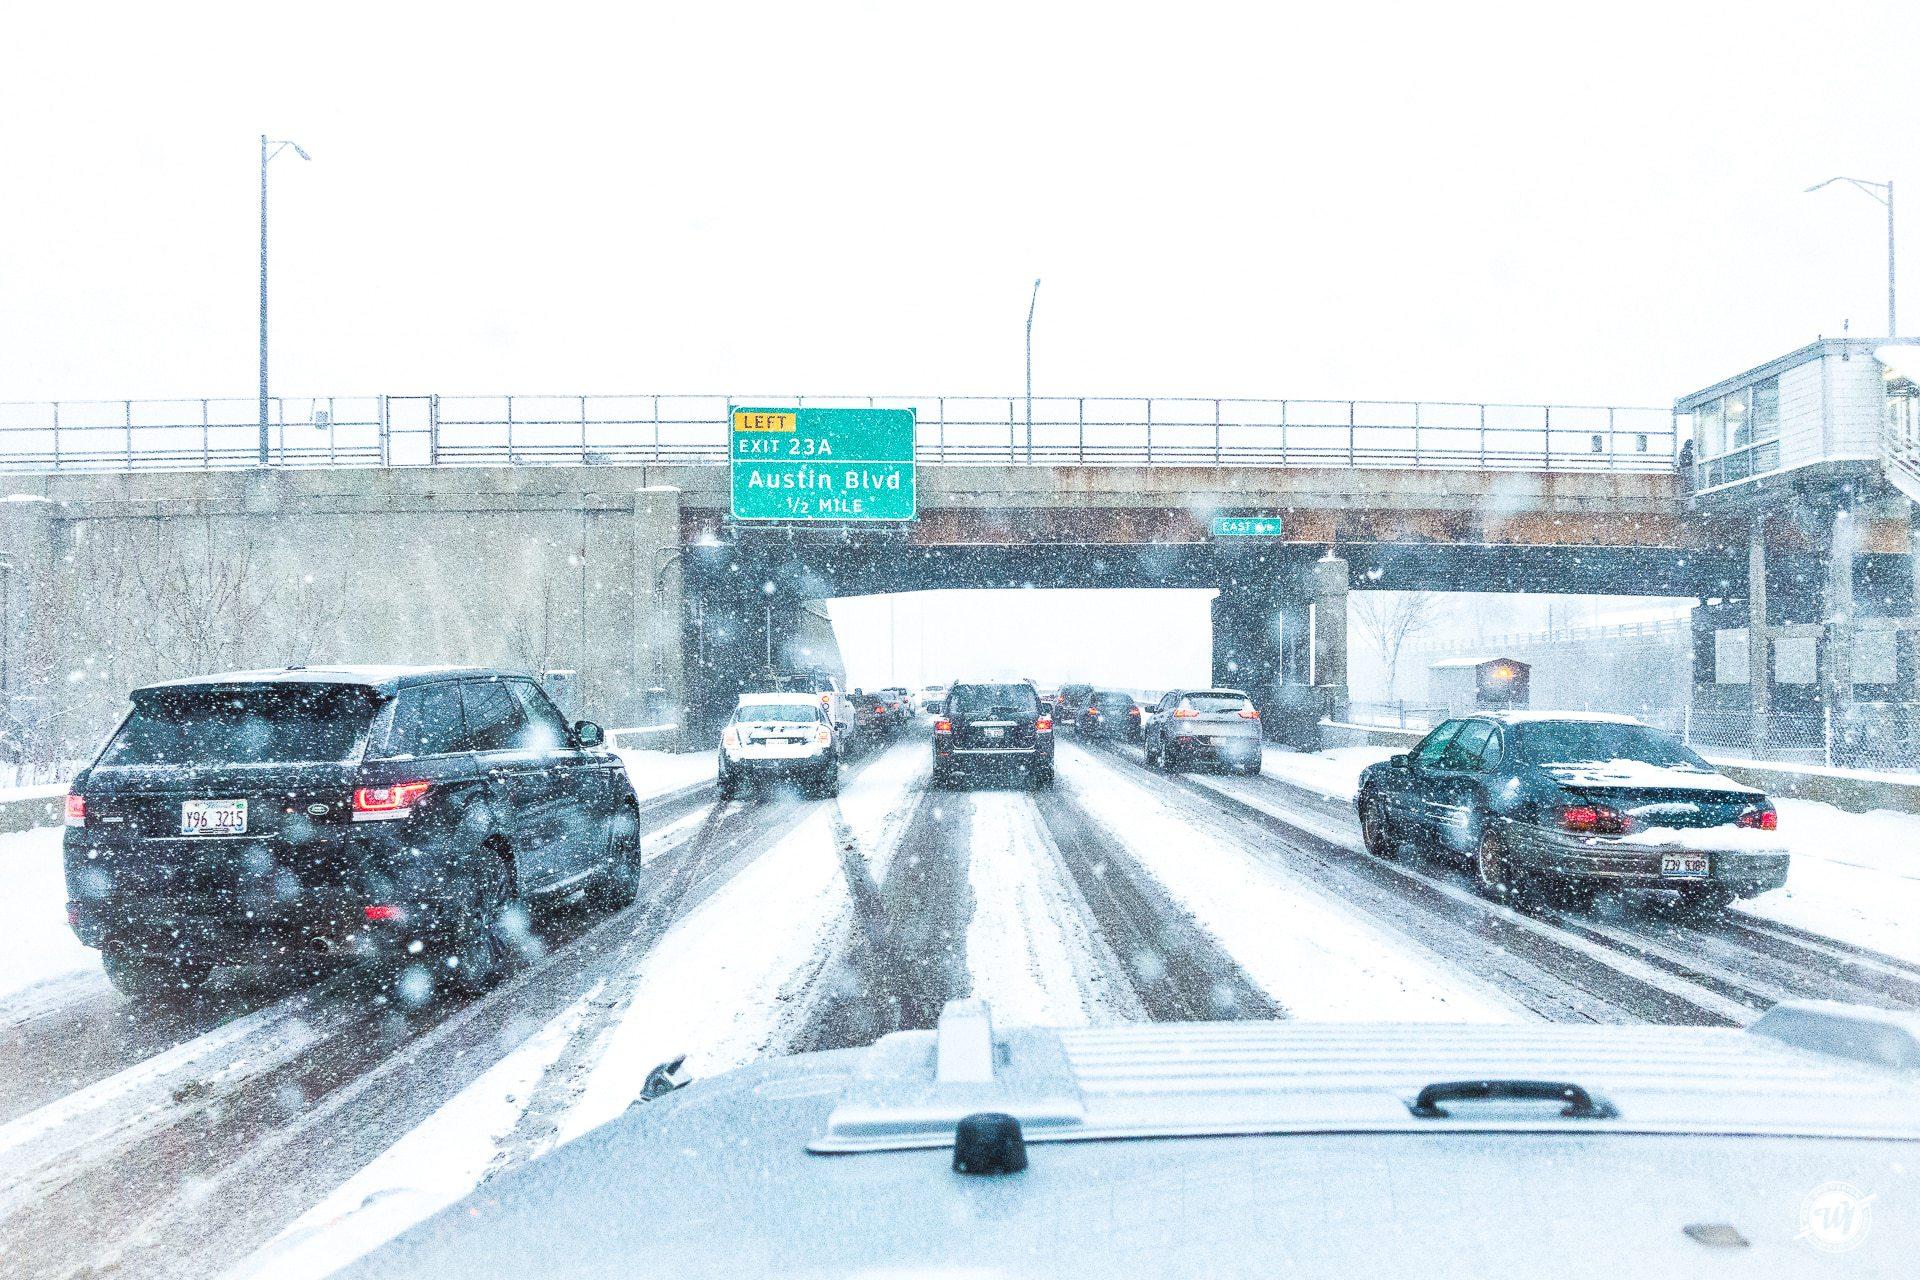 Snowy Chicago Commute in March Ward 1 Design